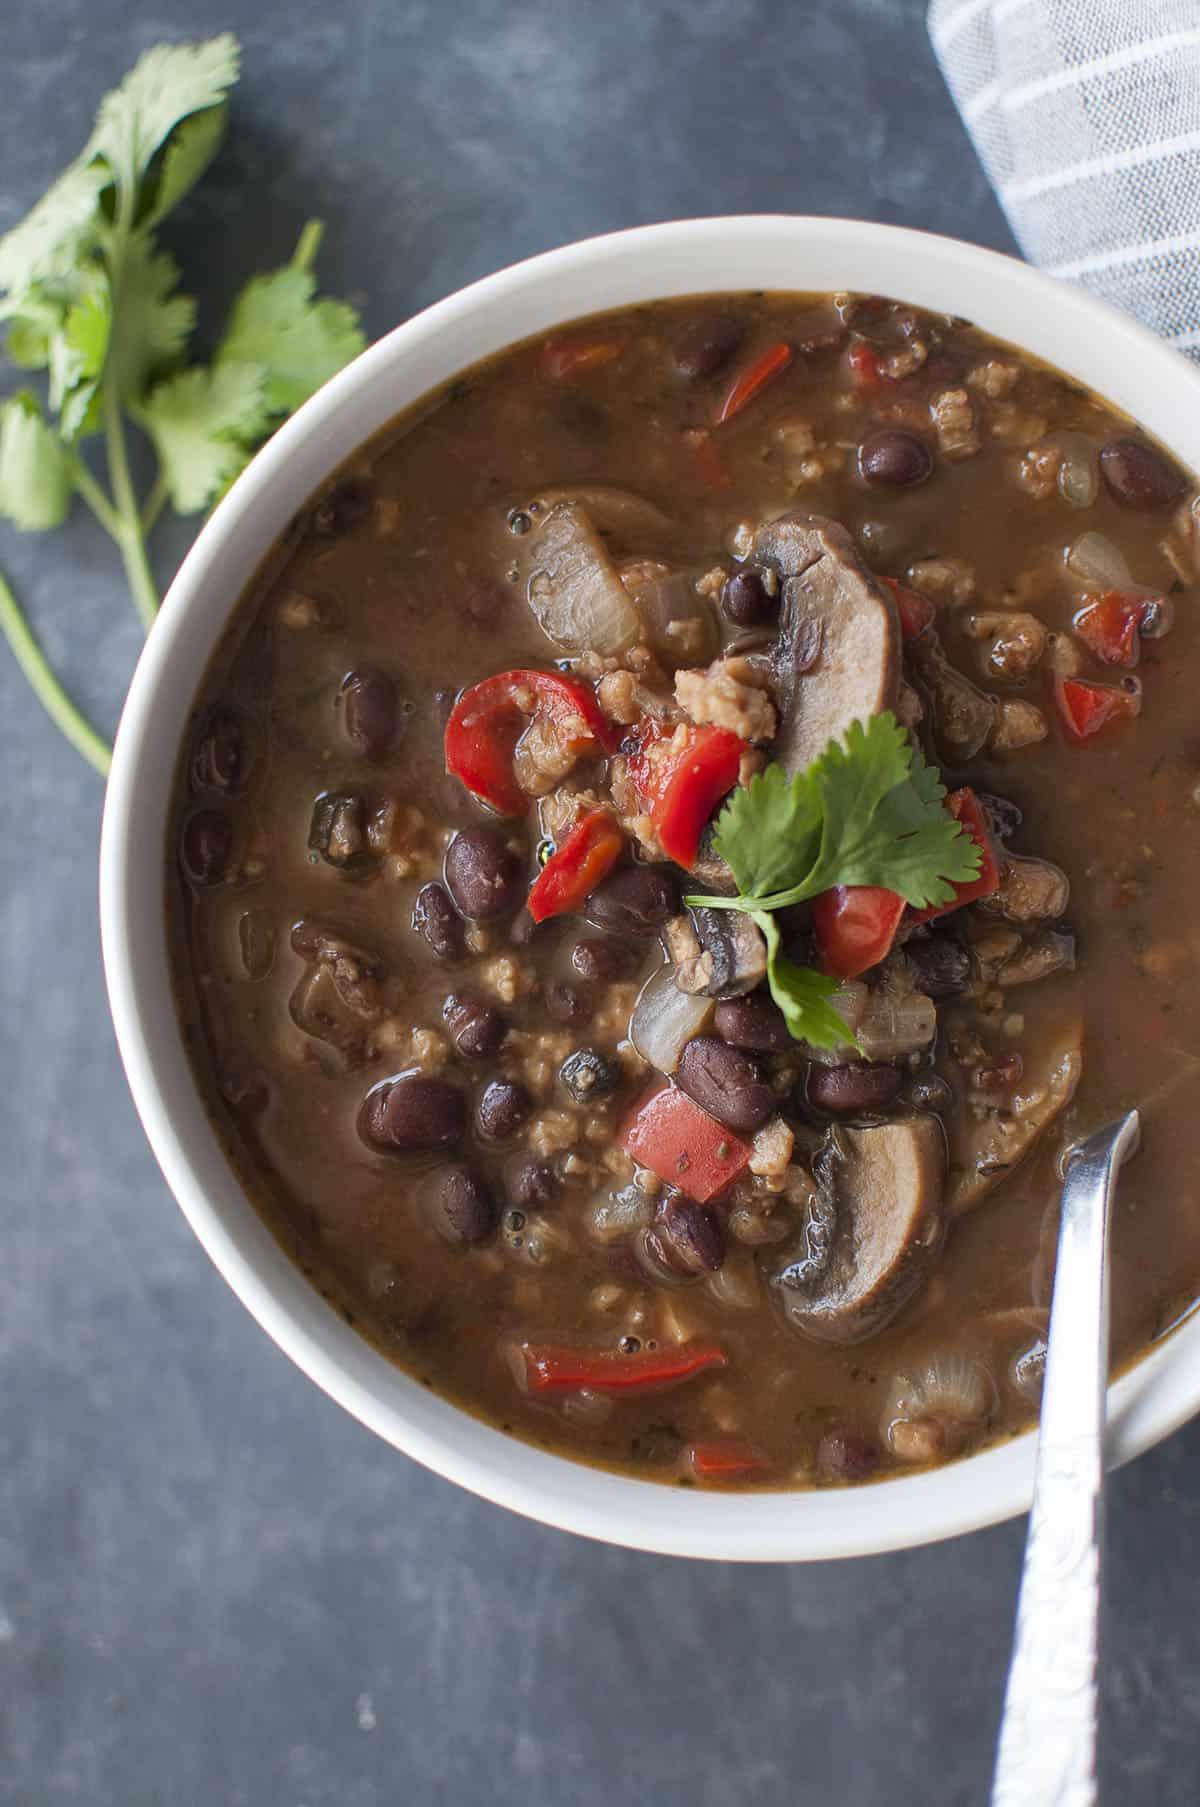 White bowl with chunky black bean stew topped with cilantro